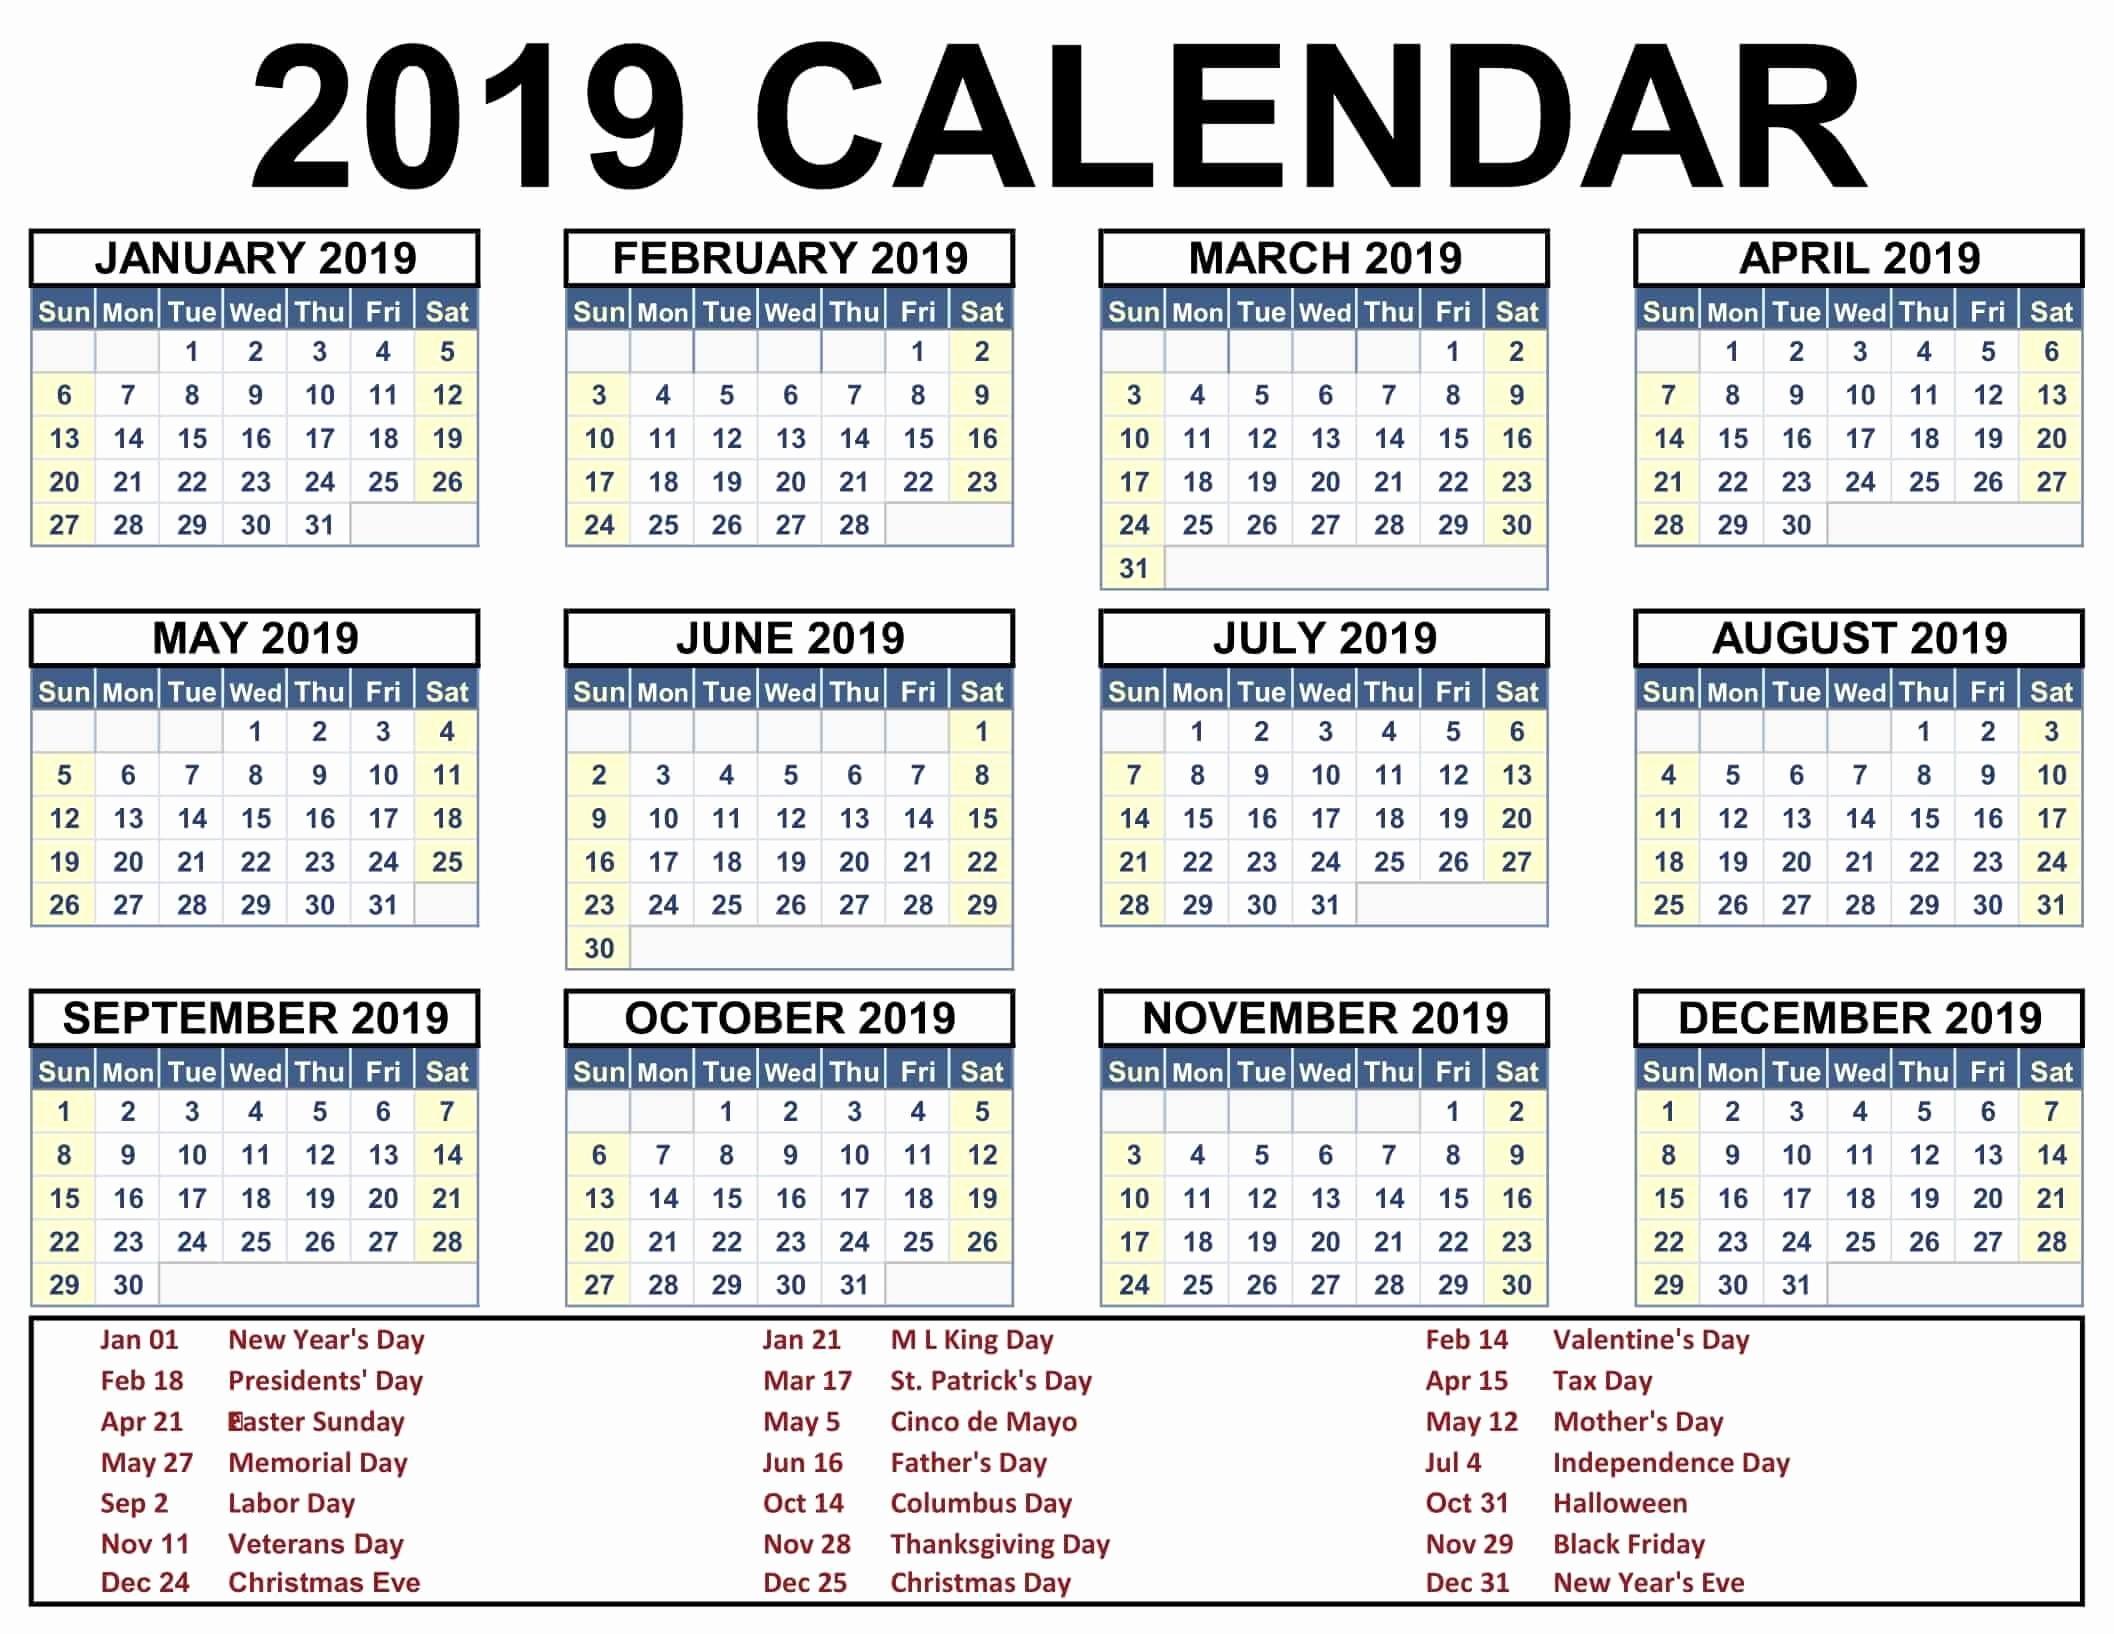 Luxury 32 Examples Hanukkah 2019 2020 Calendar | Etxettipia inside Hebrew Calendar 2019-2020